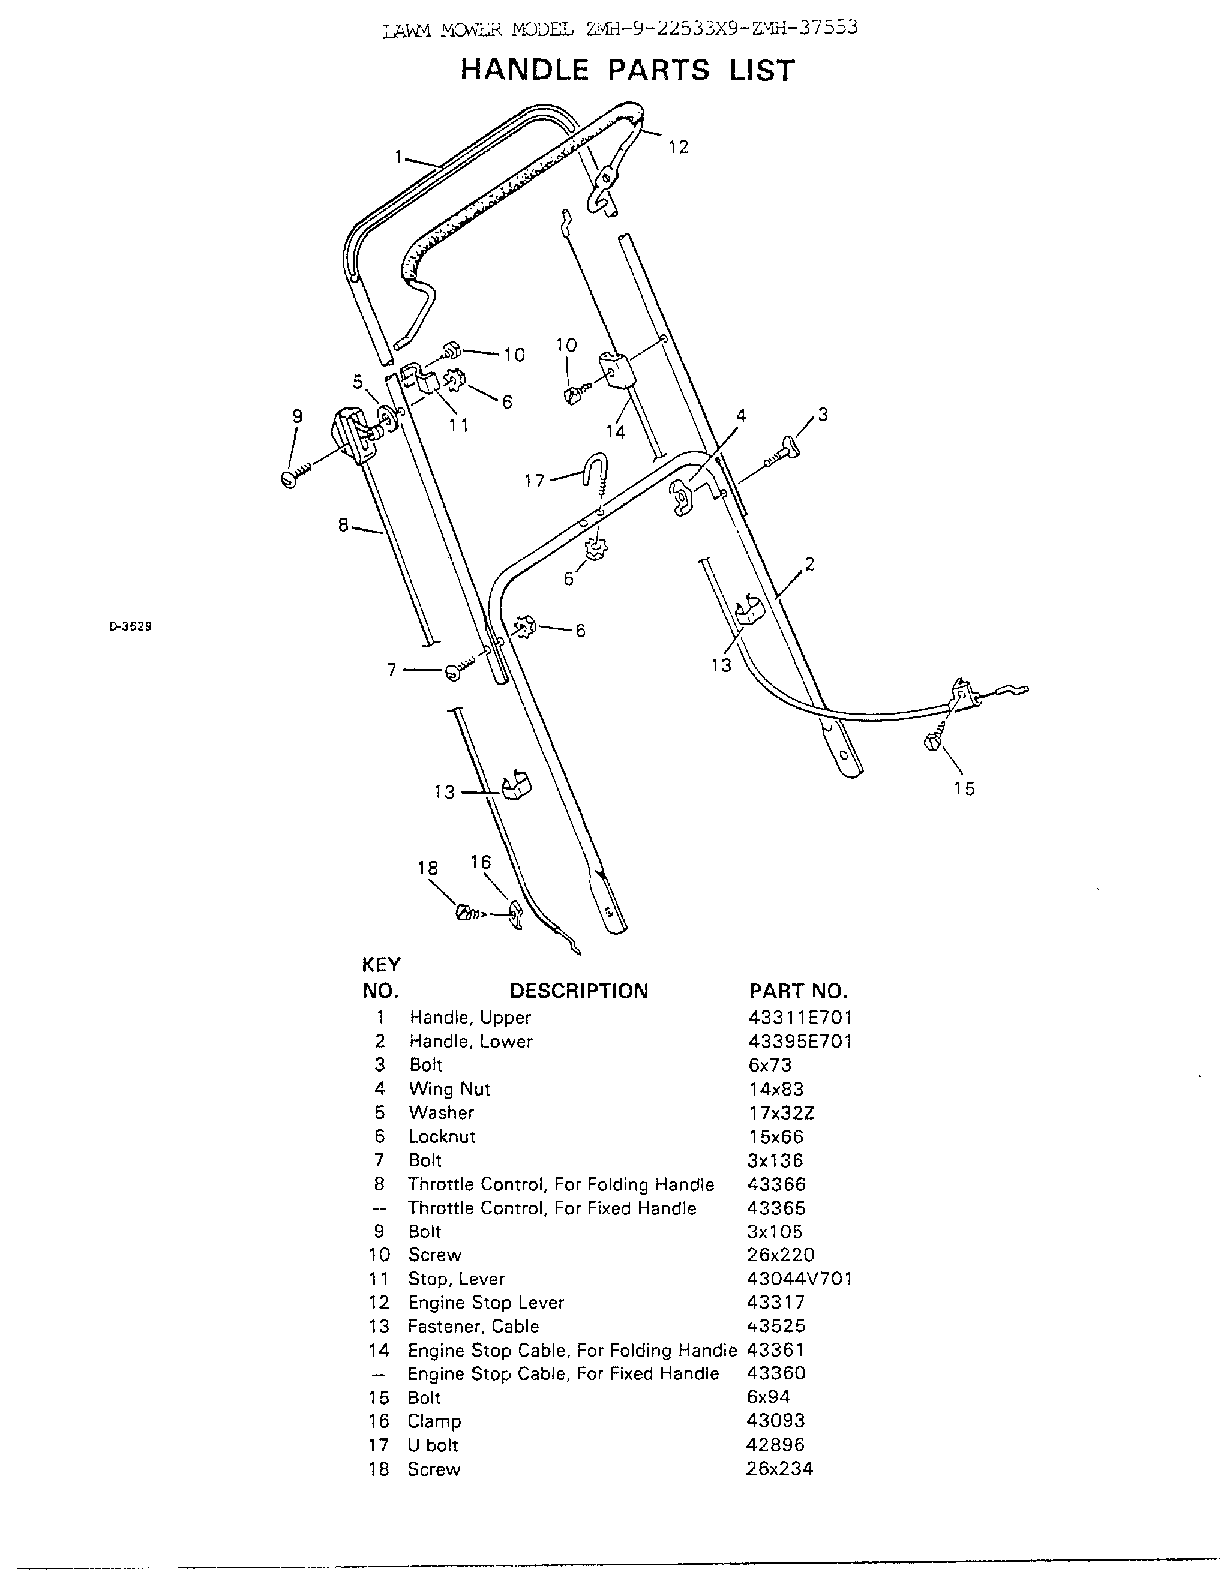 HANDLE Diagram & Parts List for Model 922543x9 Murray